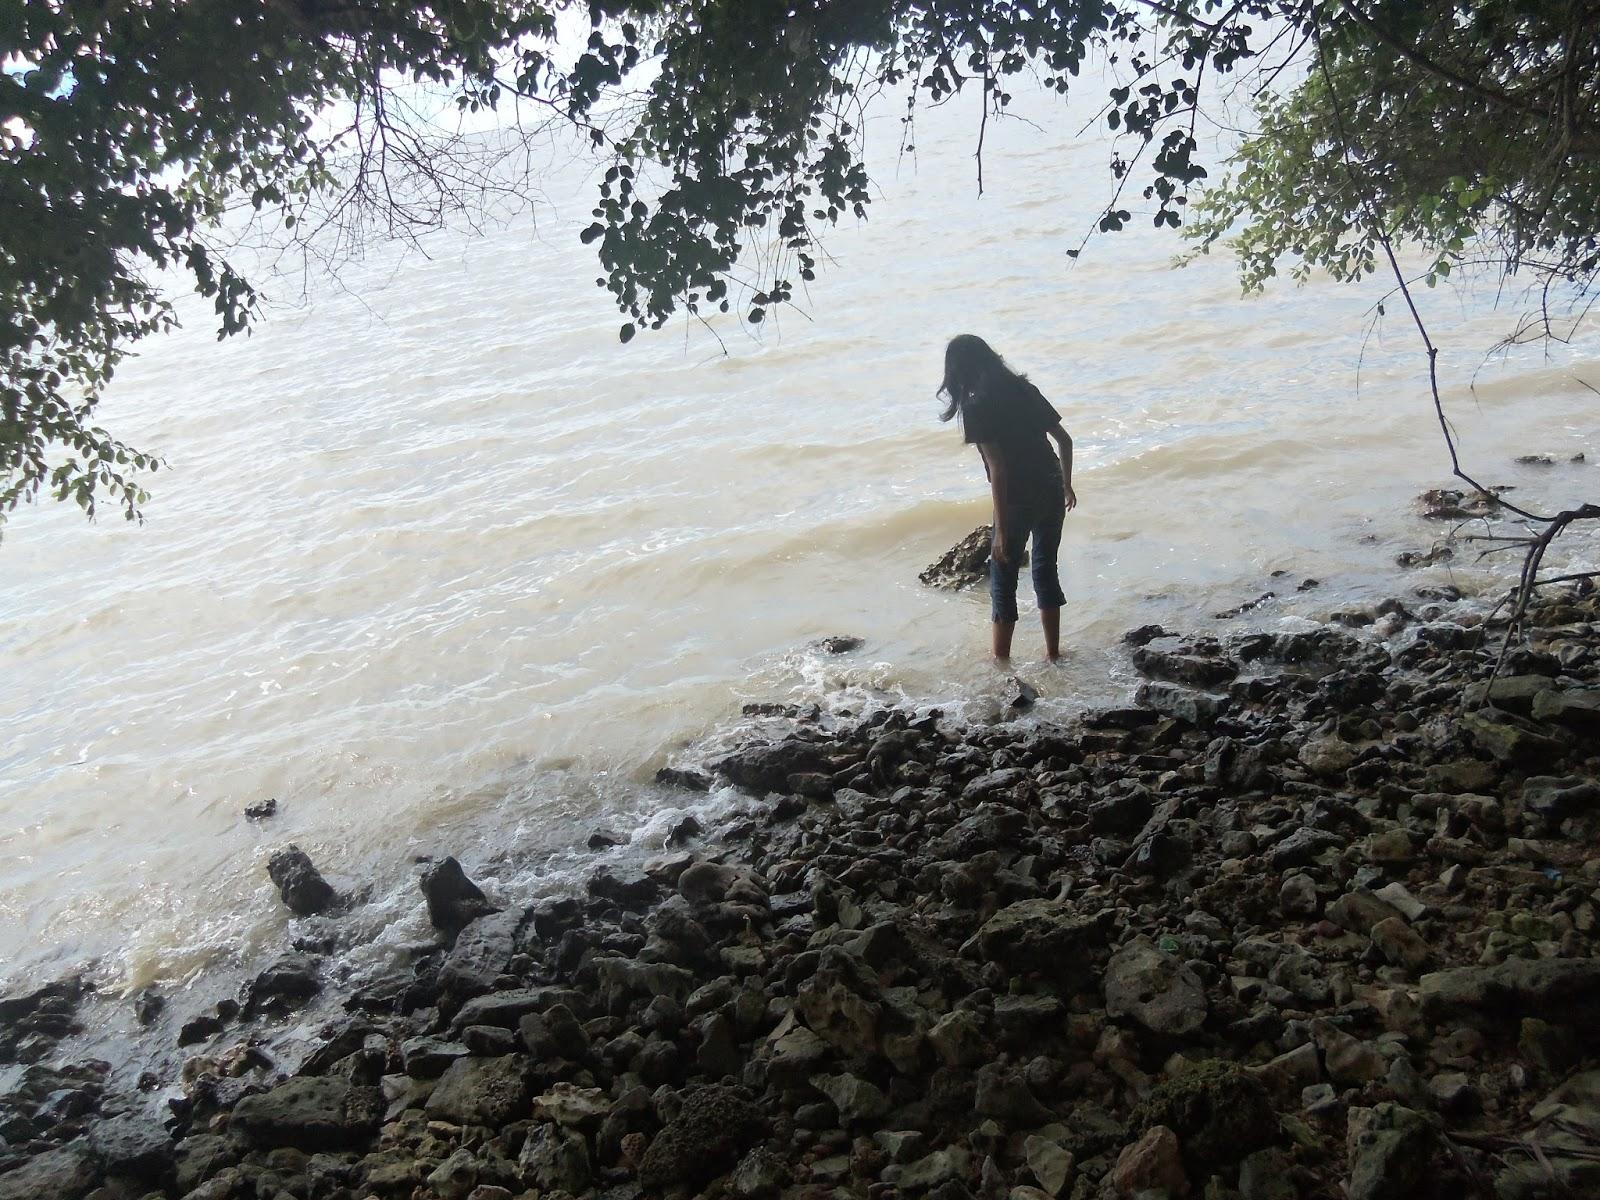 Pulau Benteng Mengare Kec Bungah Kab Gresik 04 April 2015